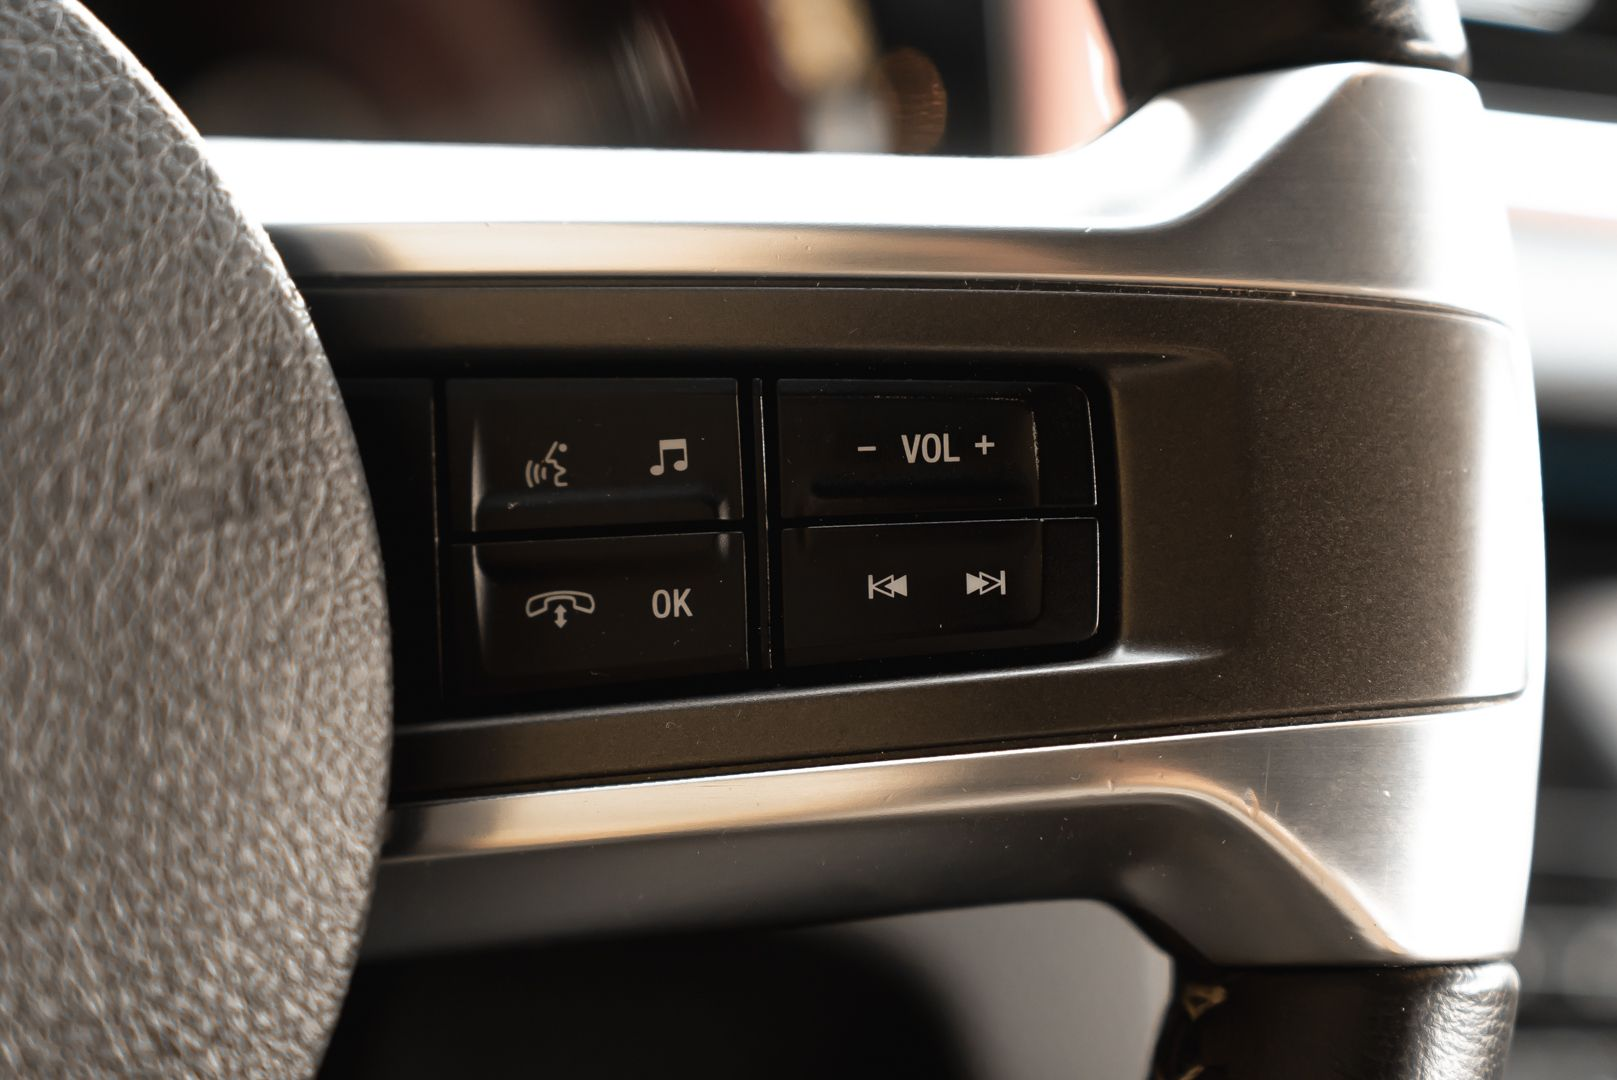 2012 Ford Mustang 5.0 V8 82099